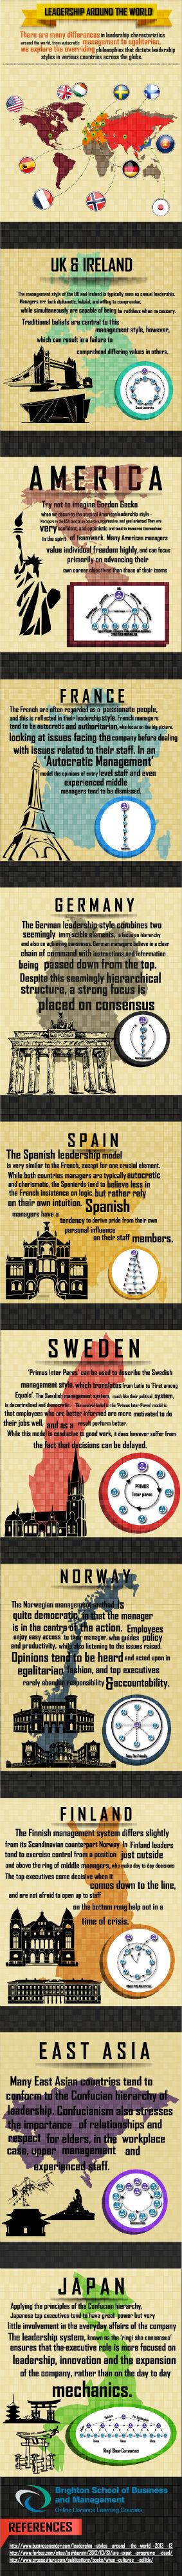 Leadership Styles around the World [Infographic]